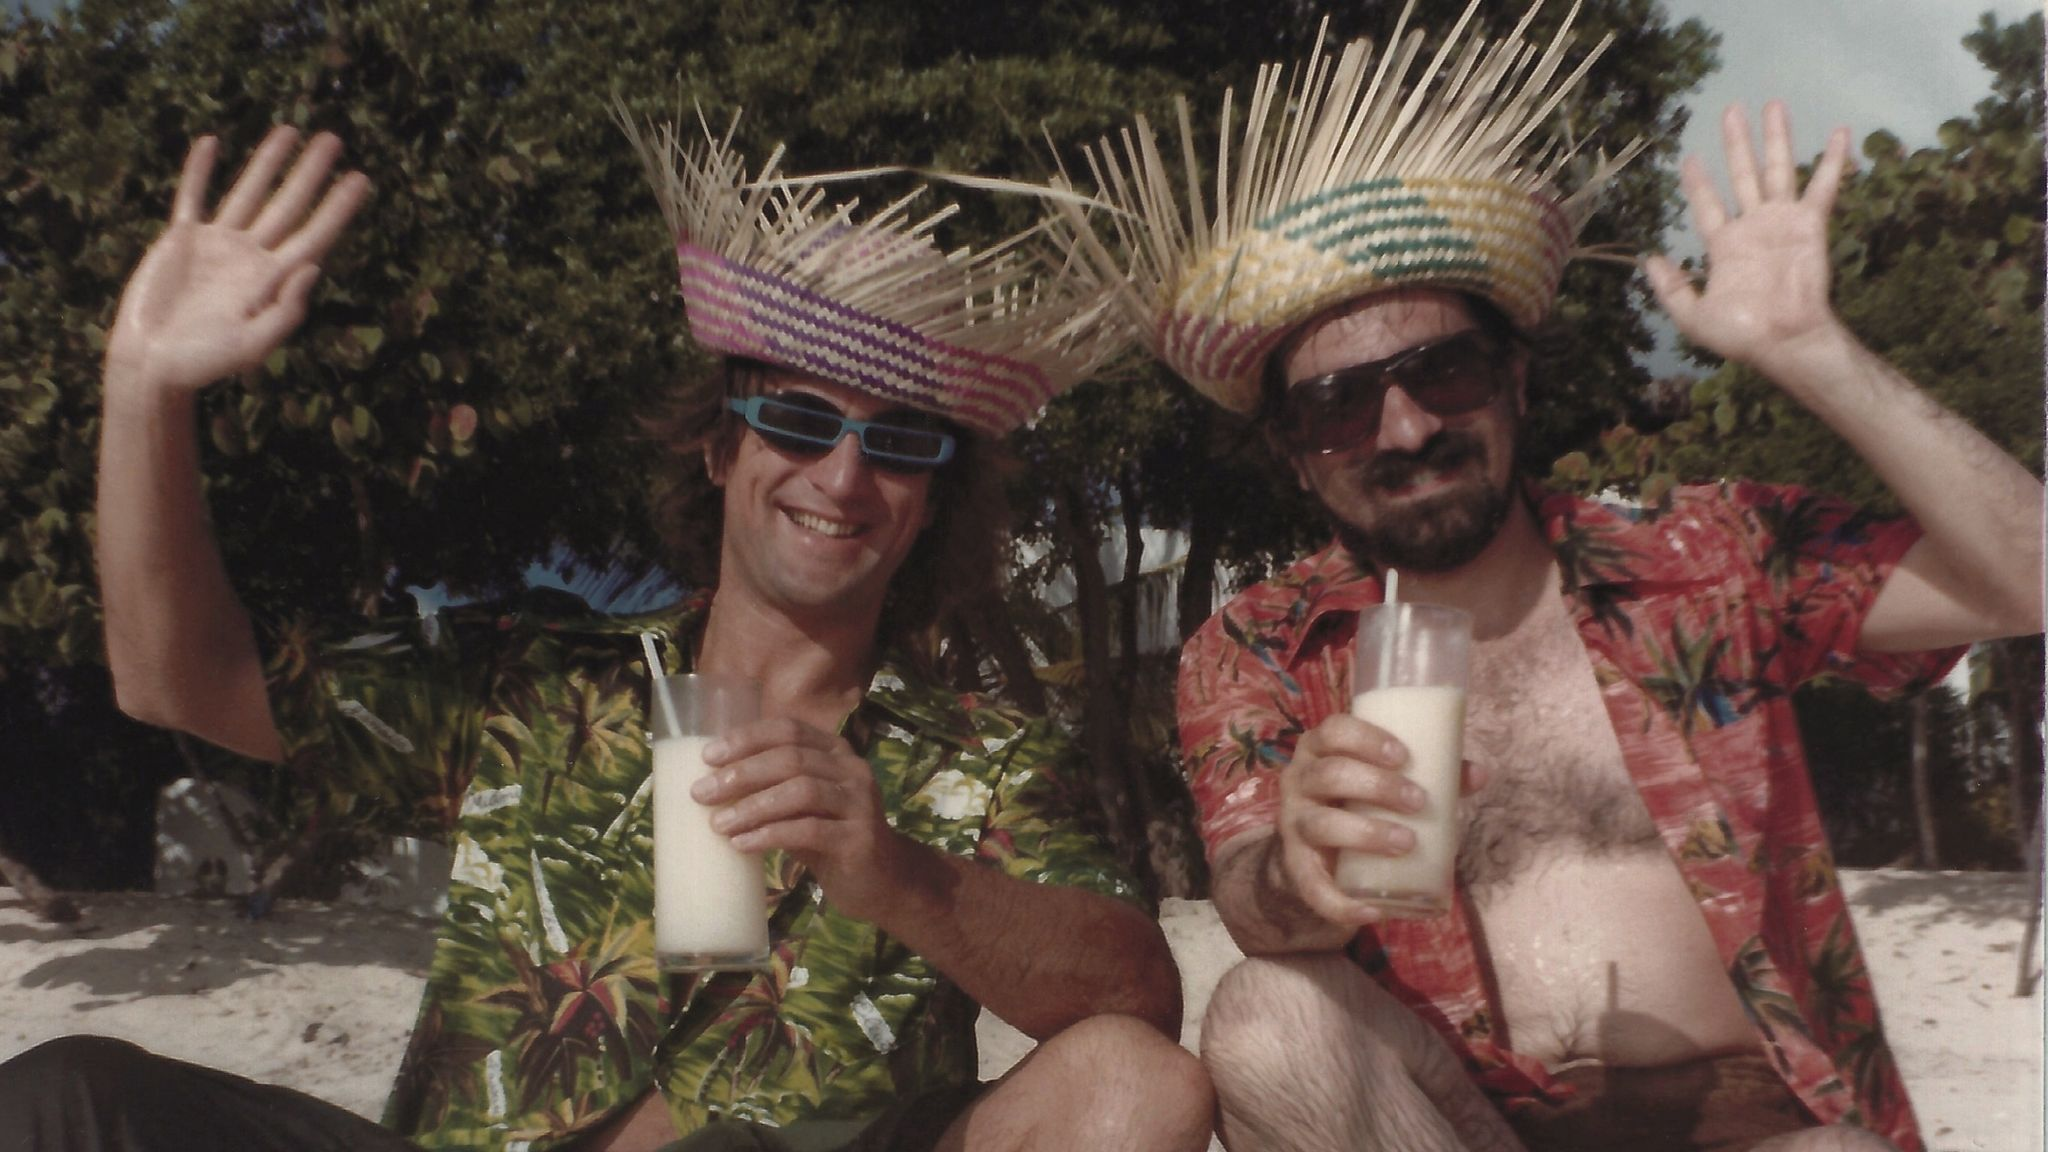 Robert De Niro and Martin Scorsese in the Caribbean. Pic: Gloria Norris courtesy of Coattail Publications